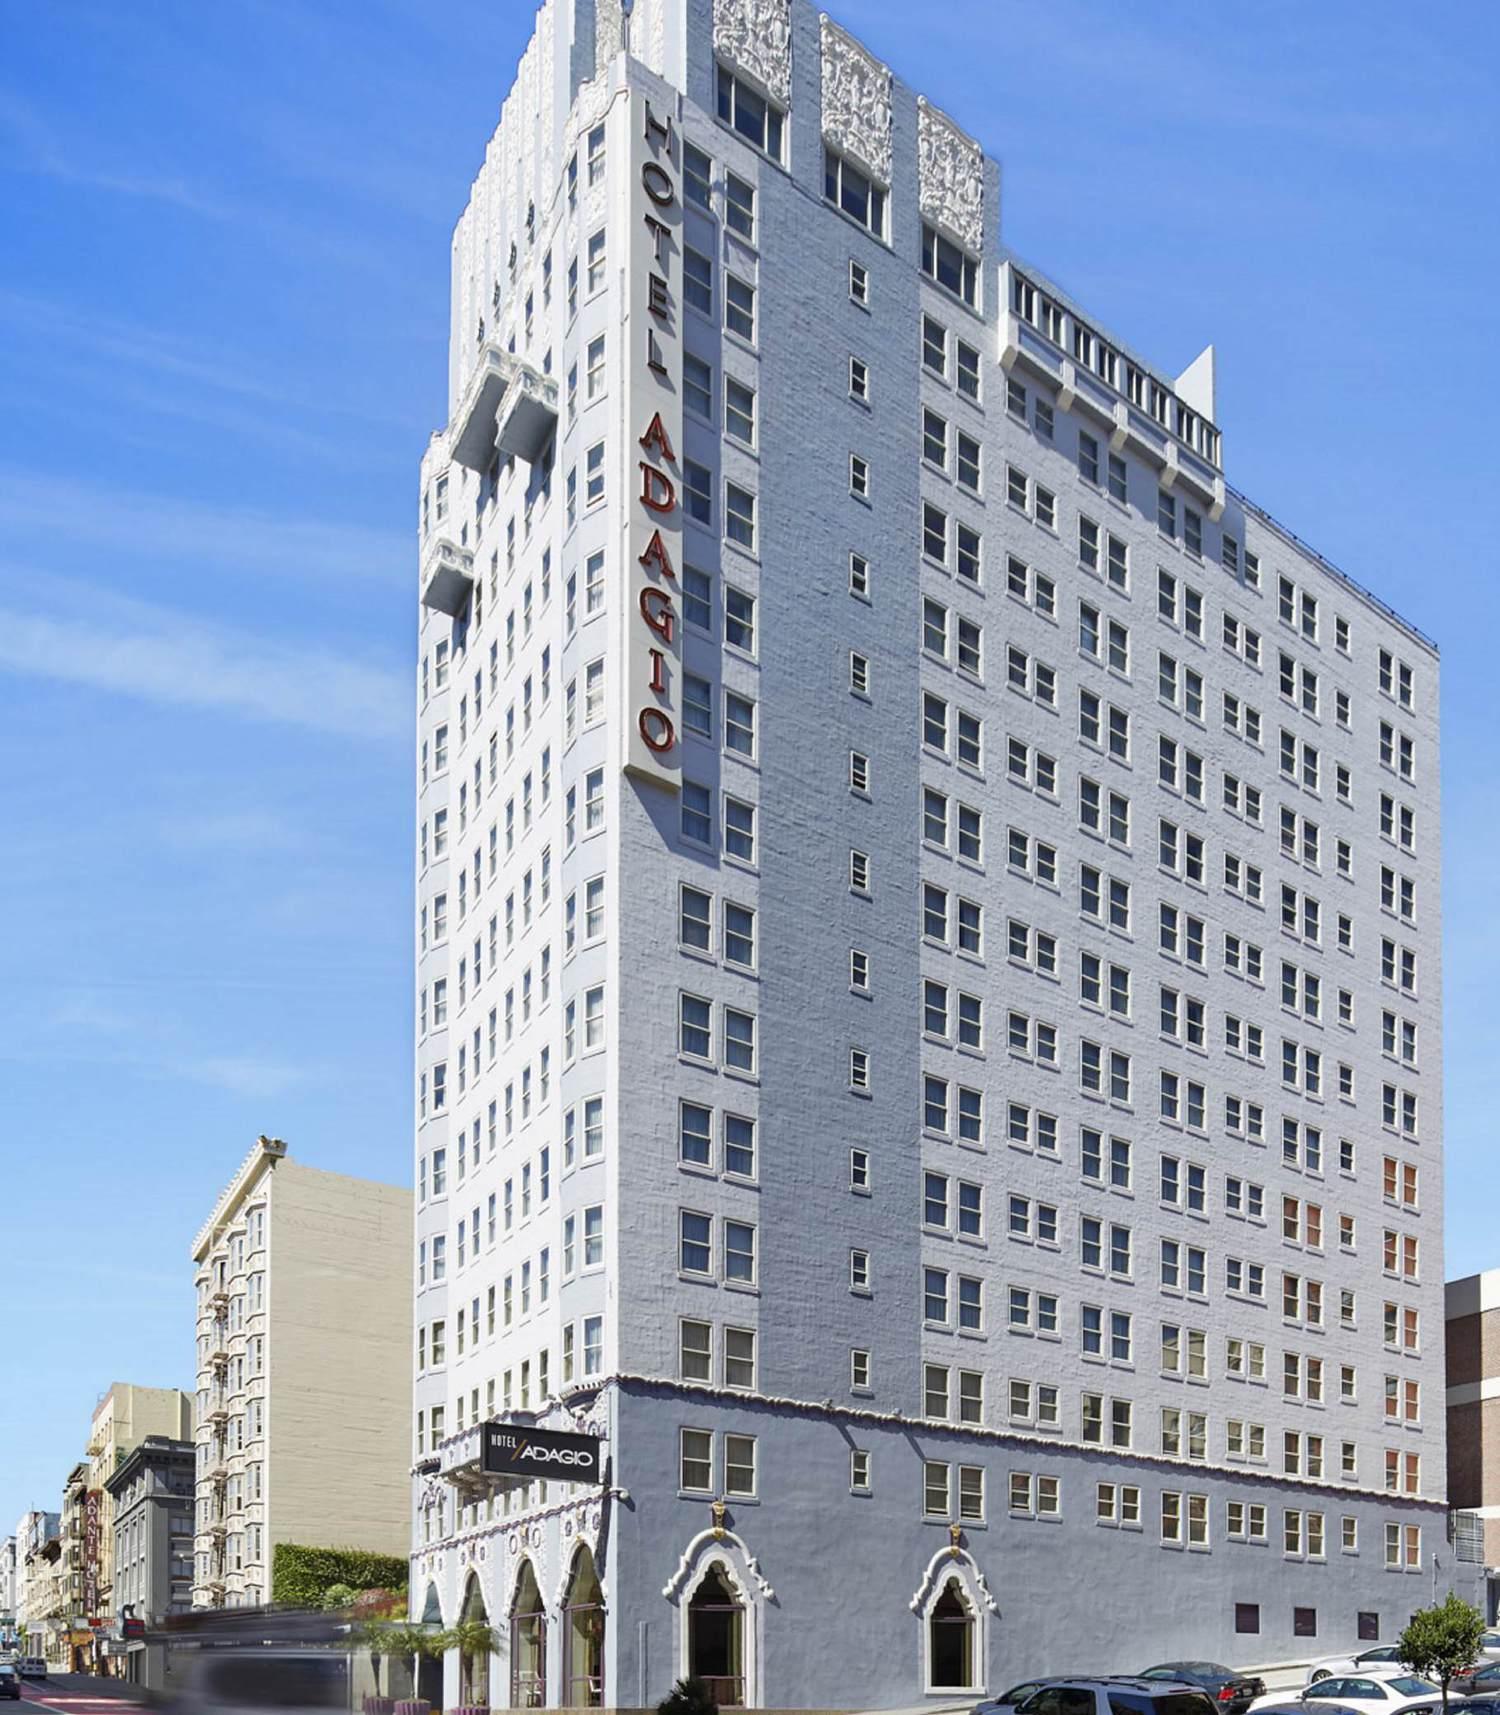 Trip Advisor San Francisco Hotel: Hotel Adagio, Autograph Collection®, San Francisco, CA